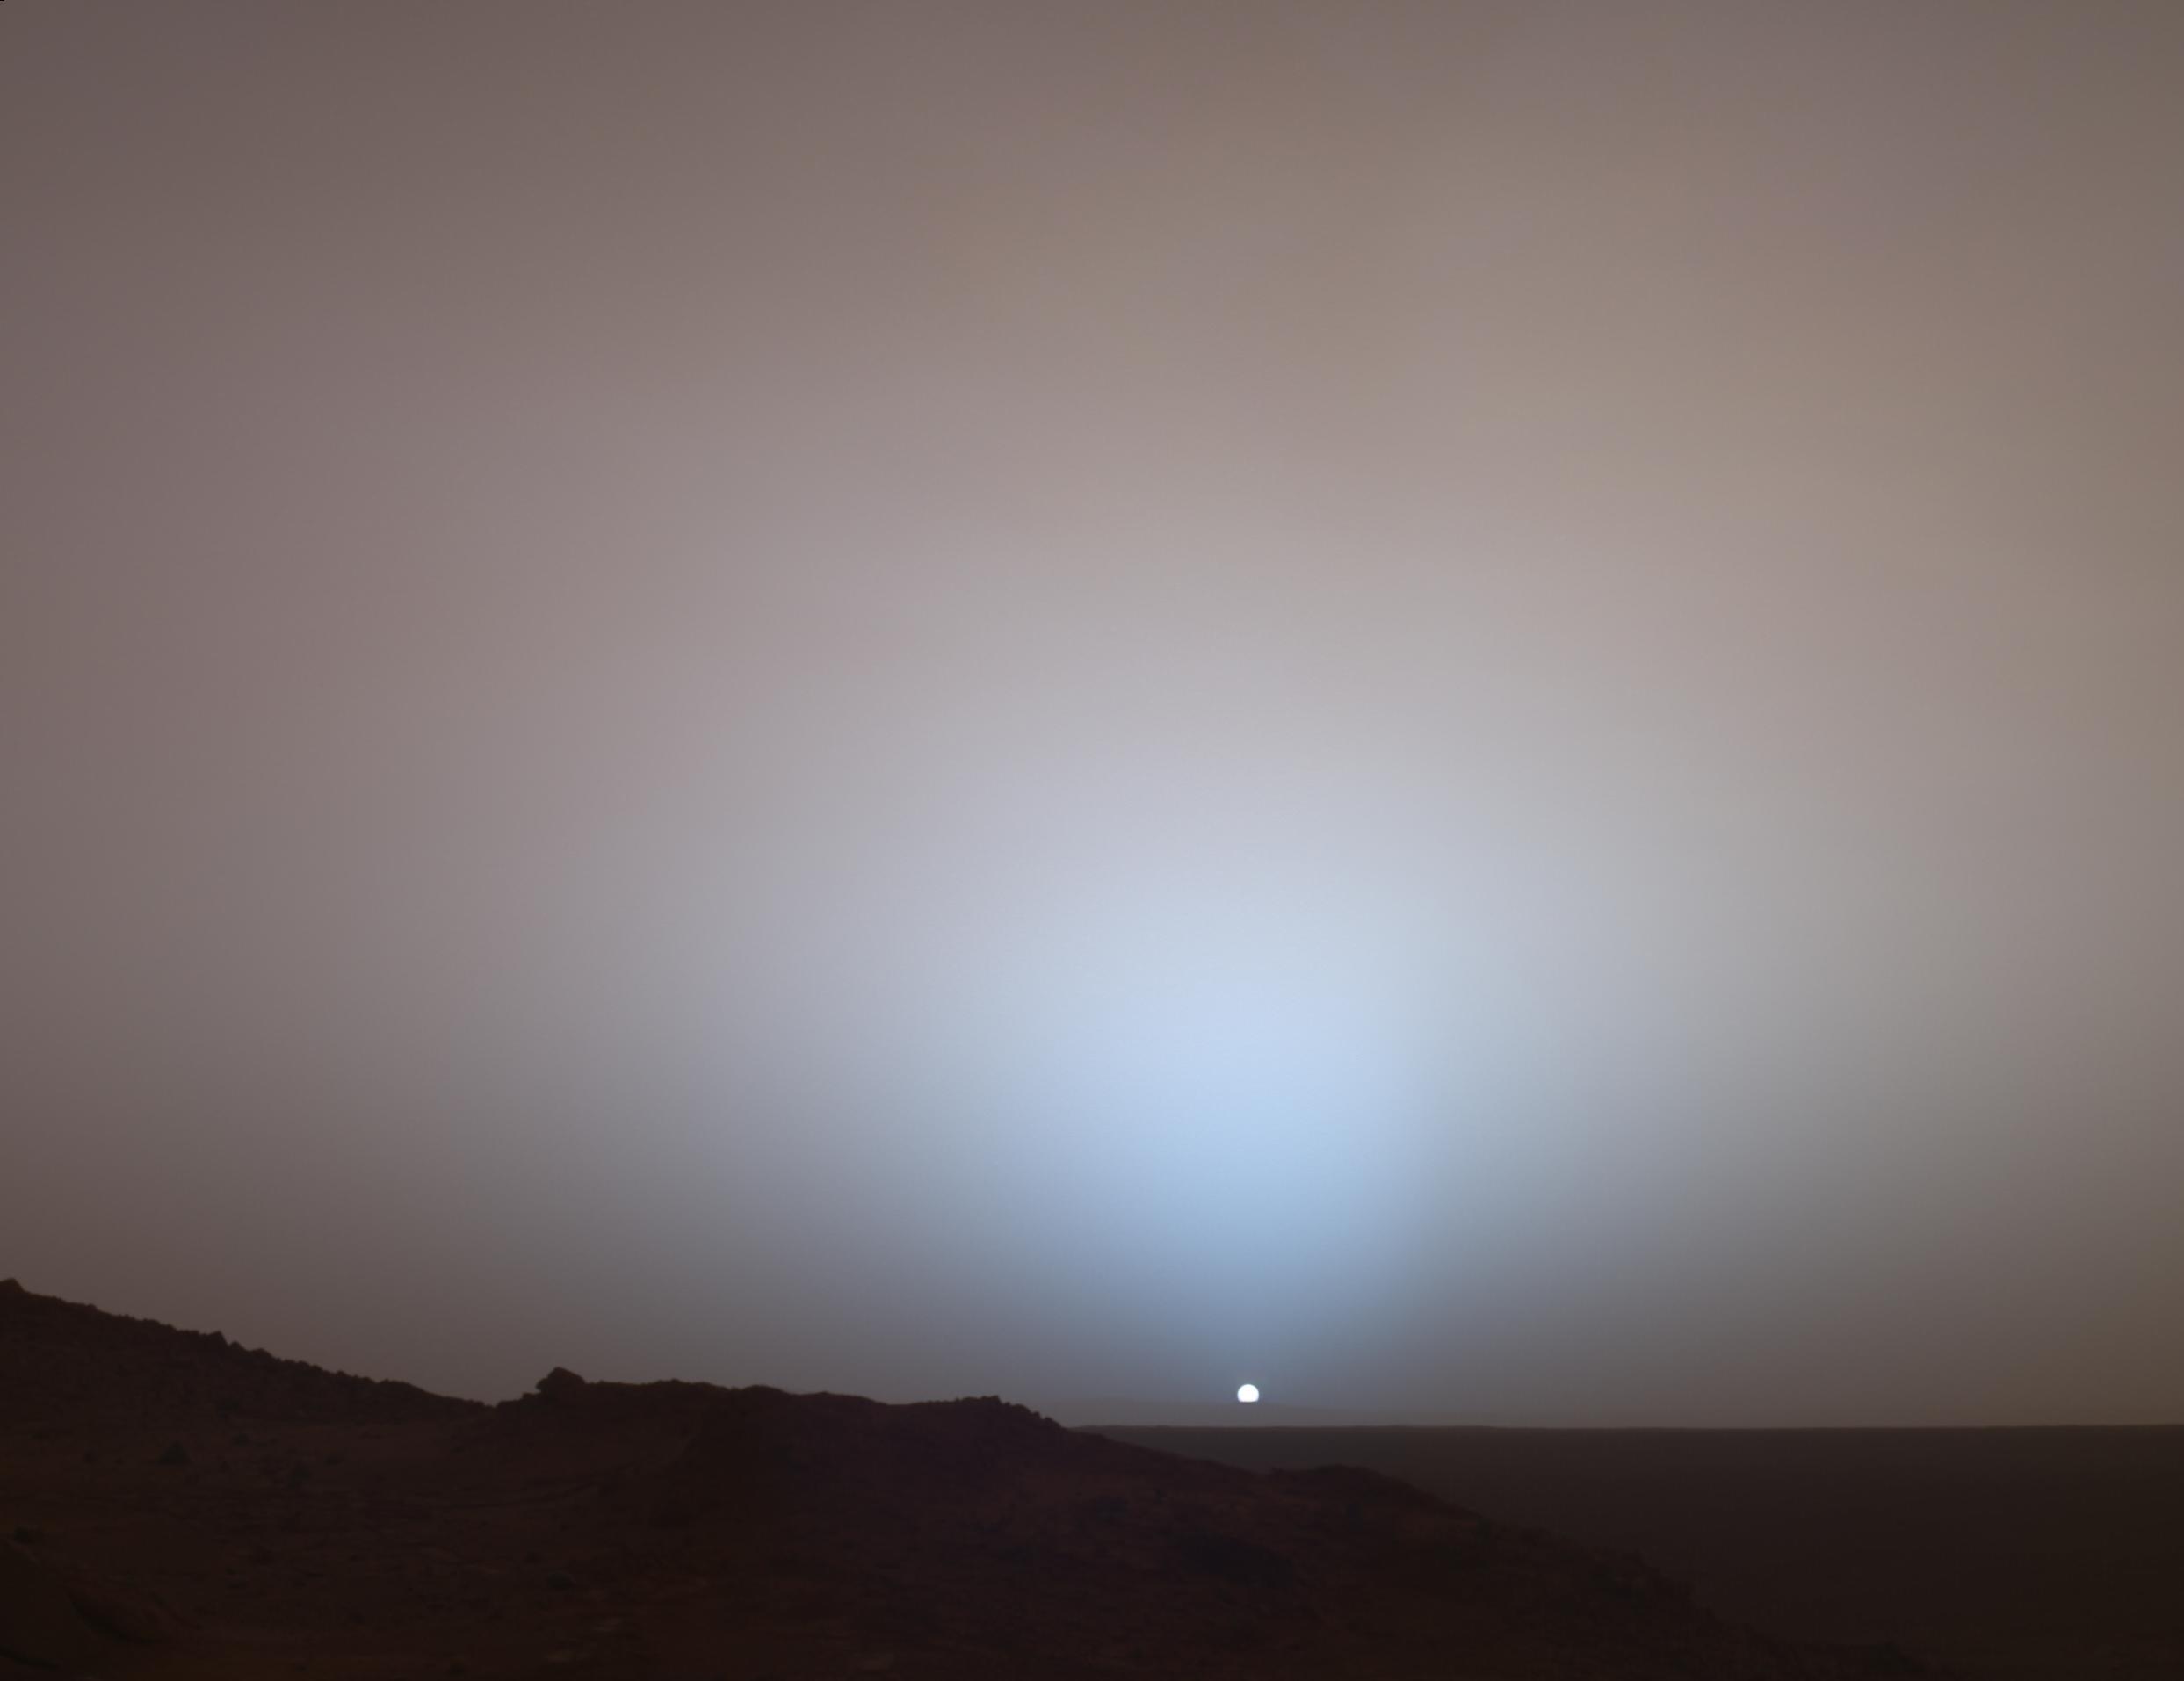 mars odyssey rover - photo #34